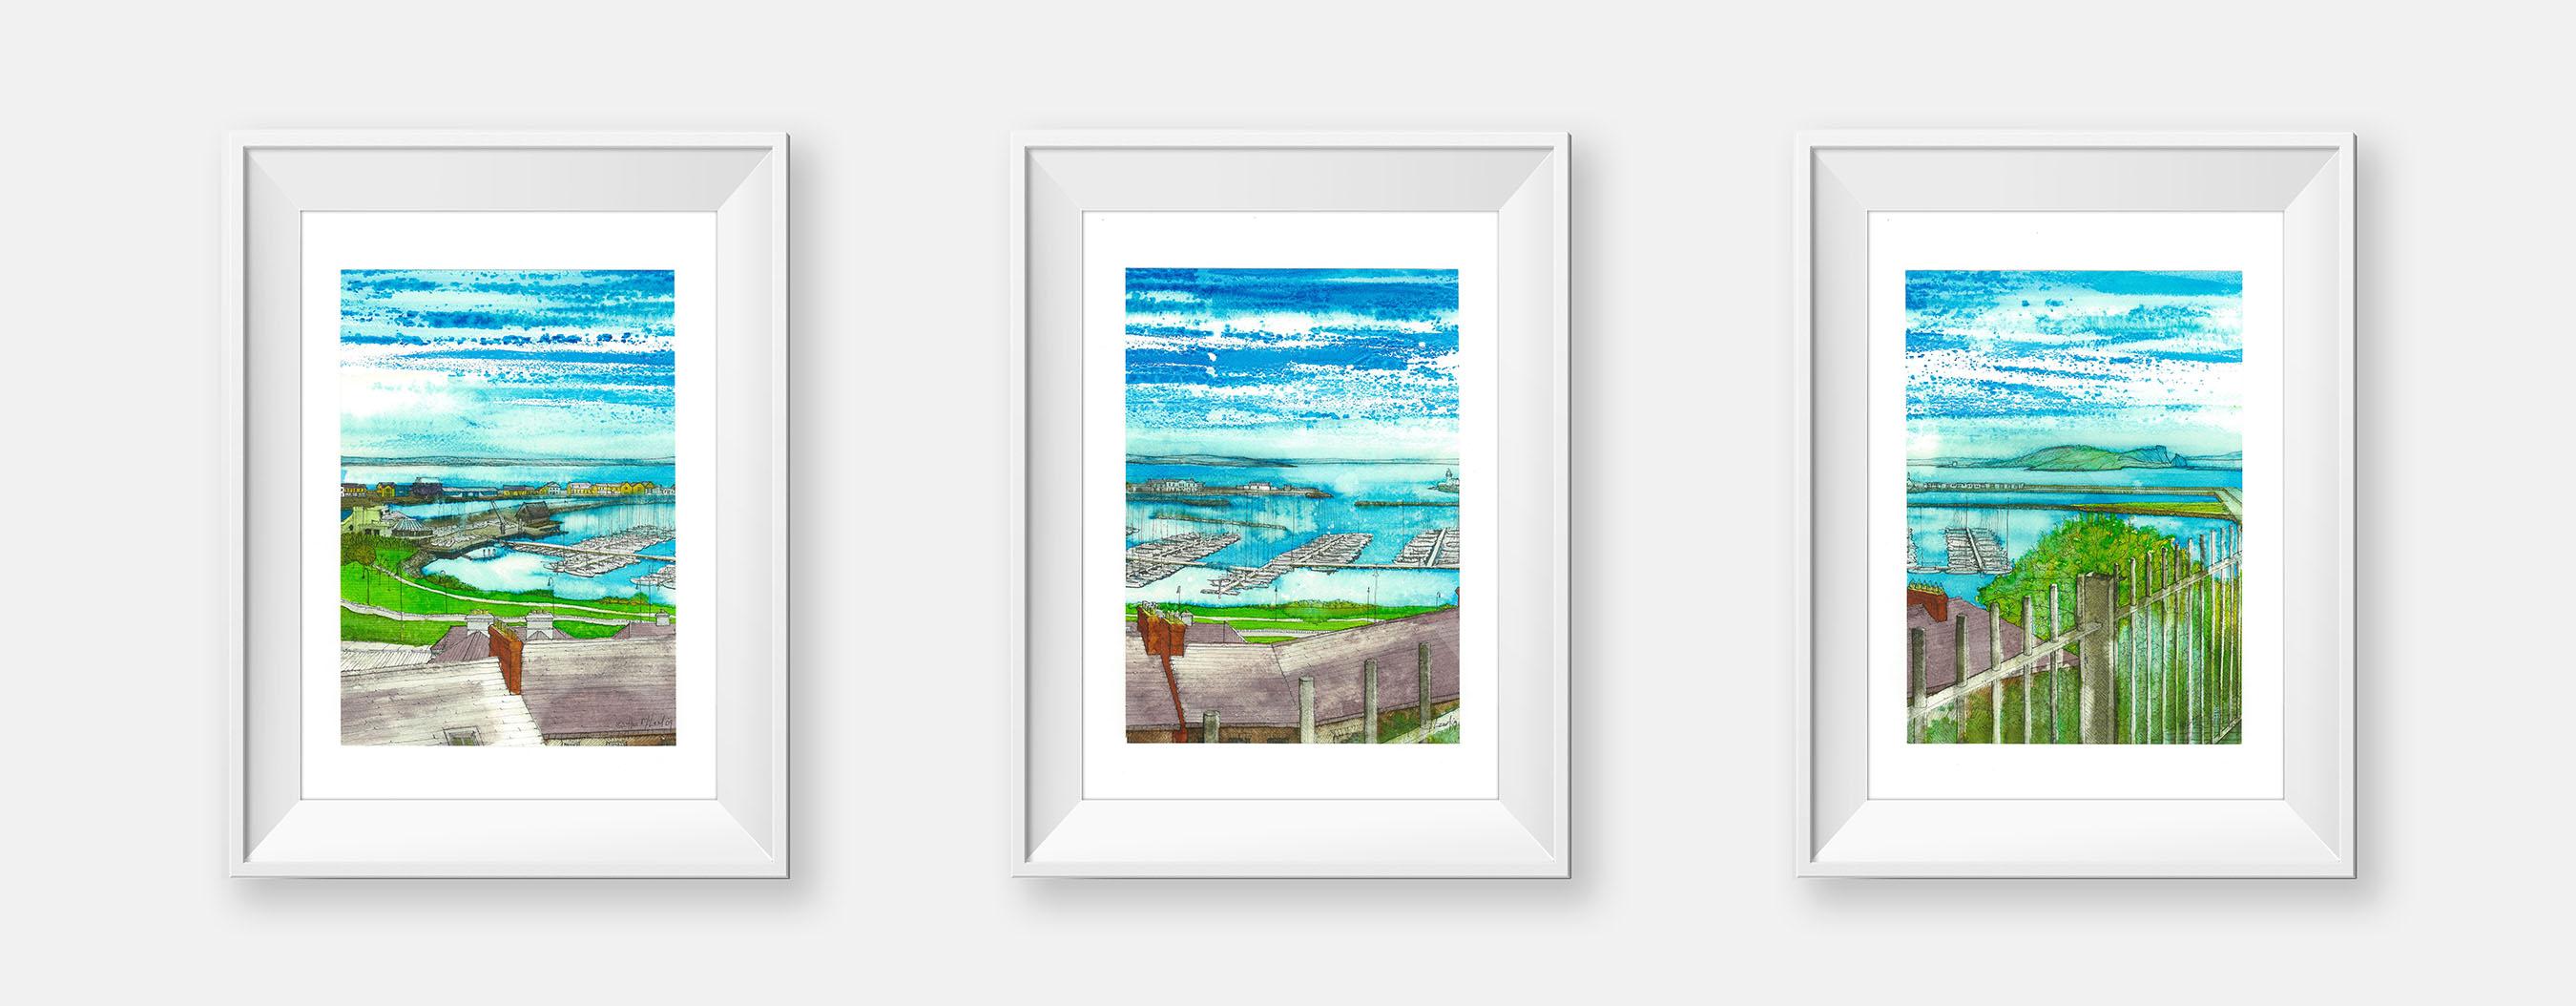 West Pier Art Studio,Alan McLeod,Art,Paintings,Prints,Hand made sea ...